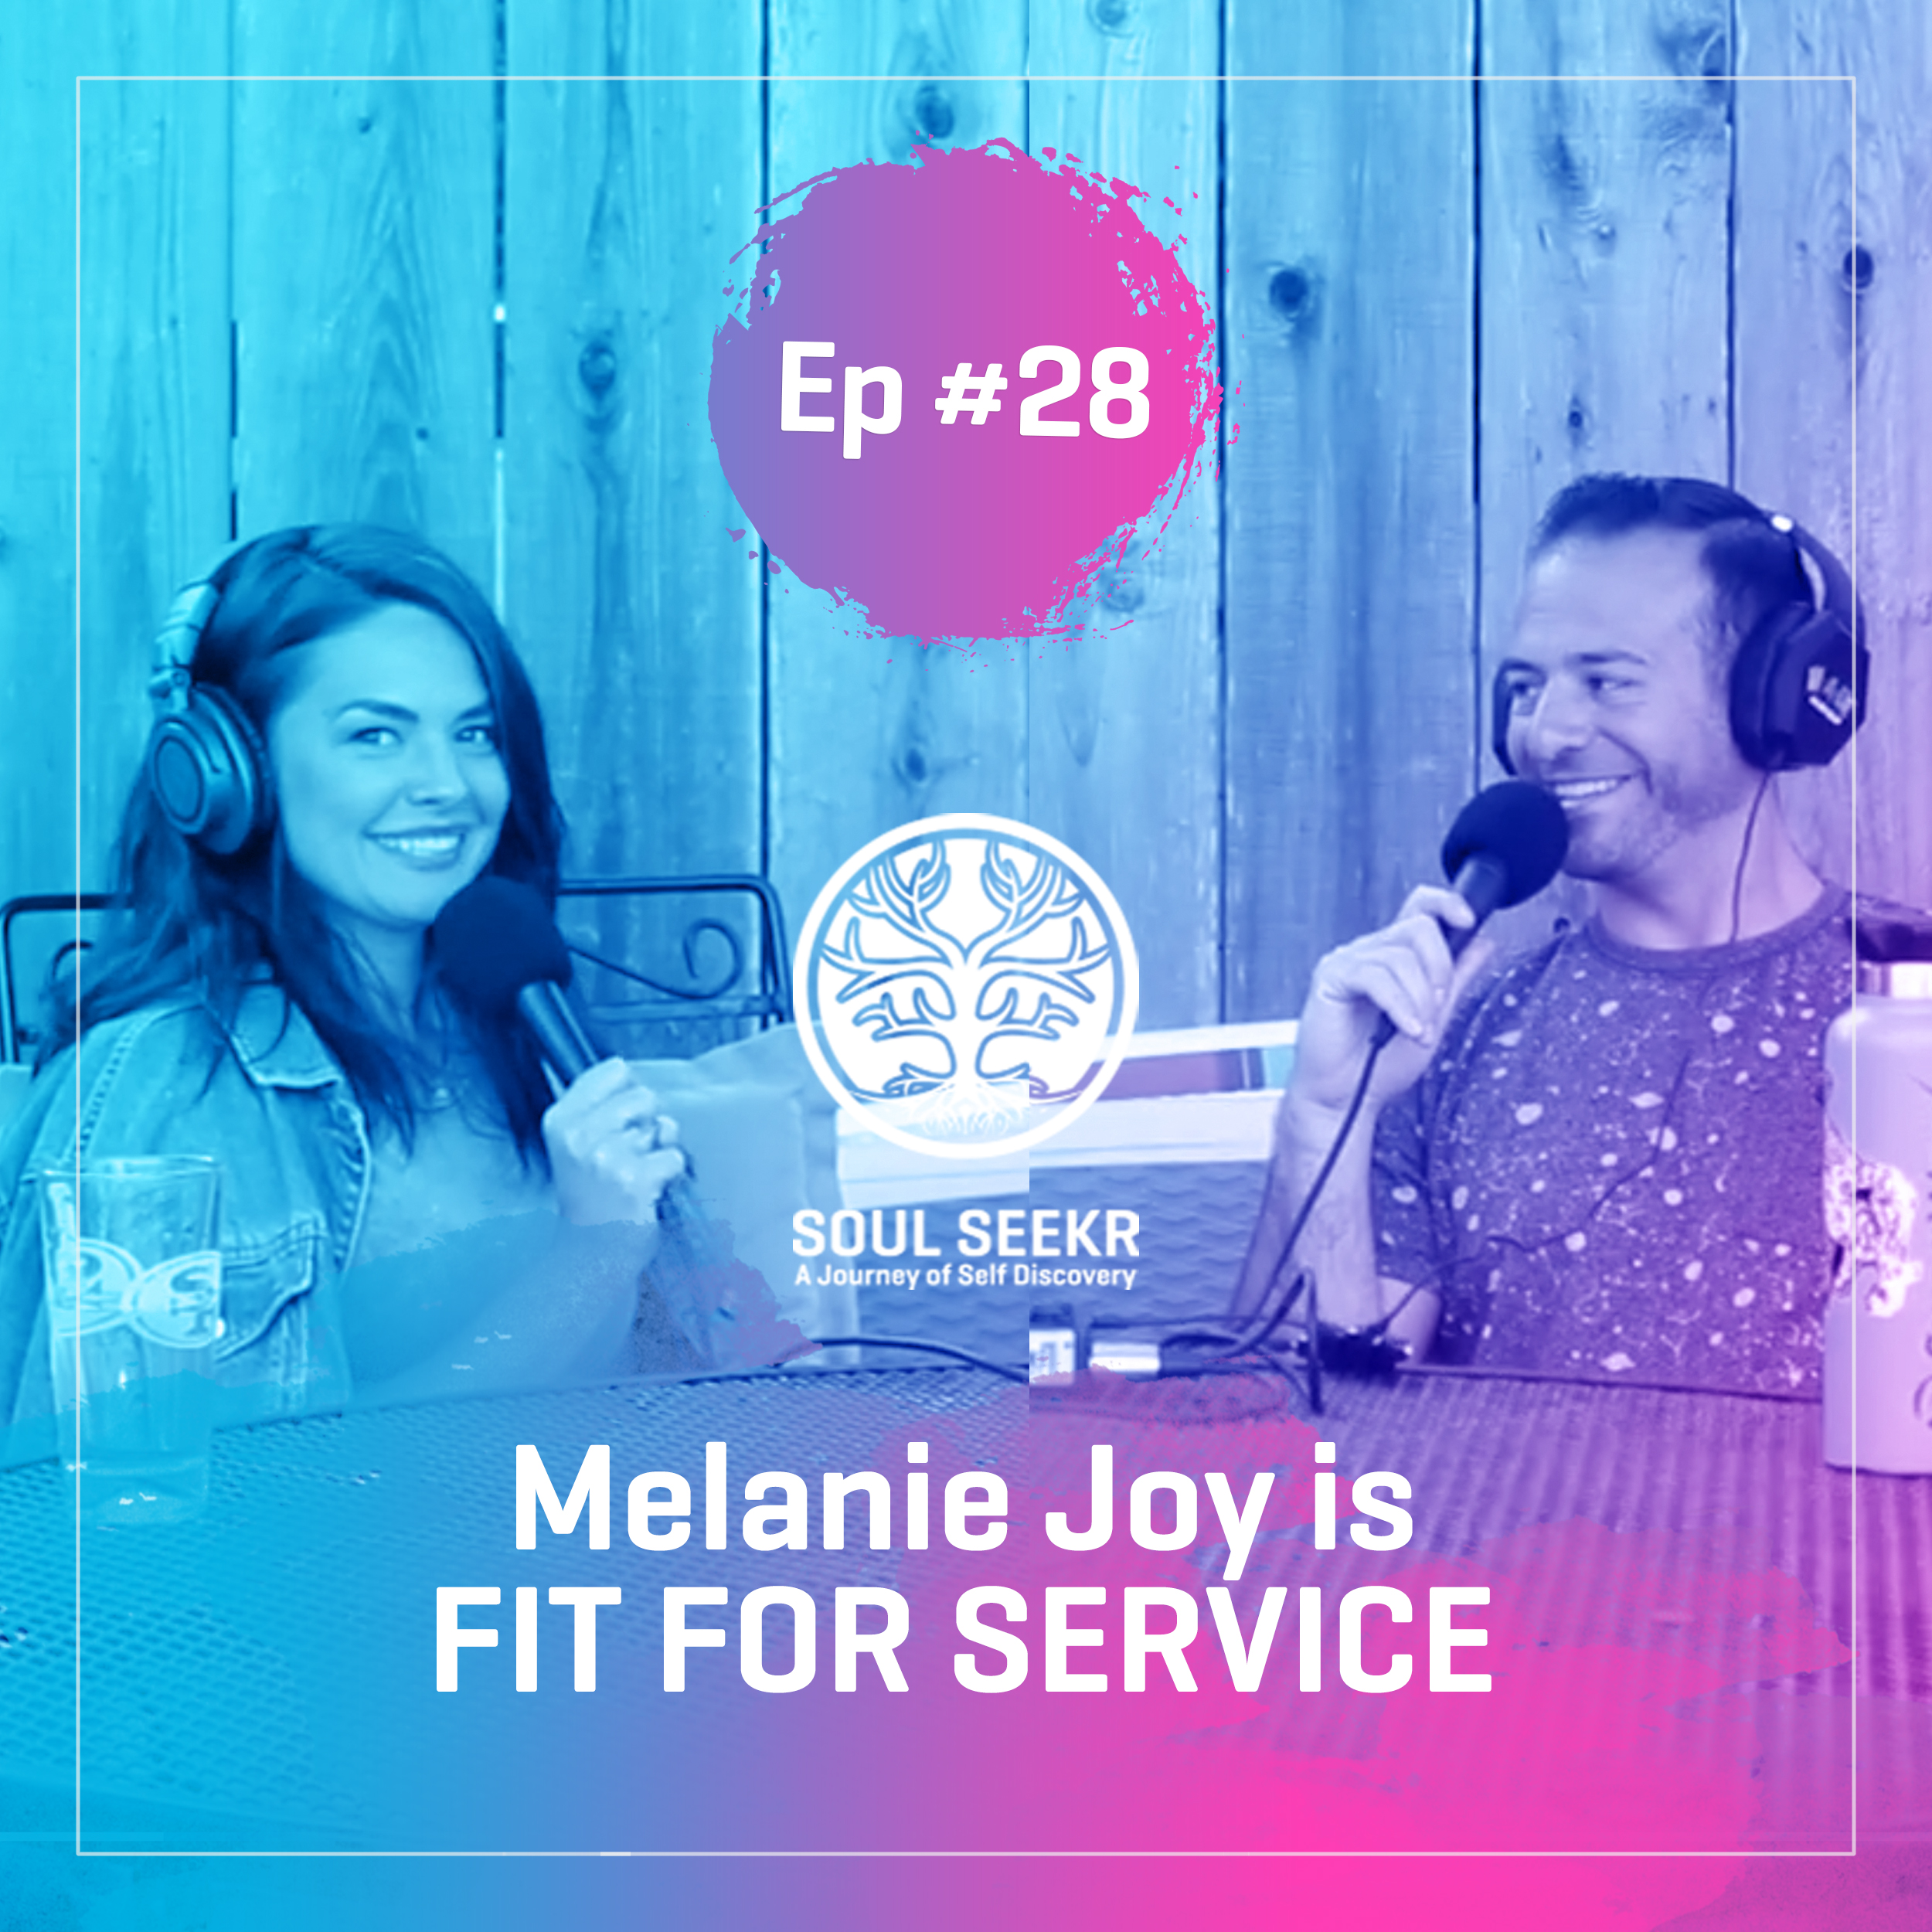 #28: Melanie Joy is Fit for Service